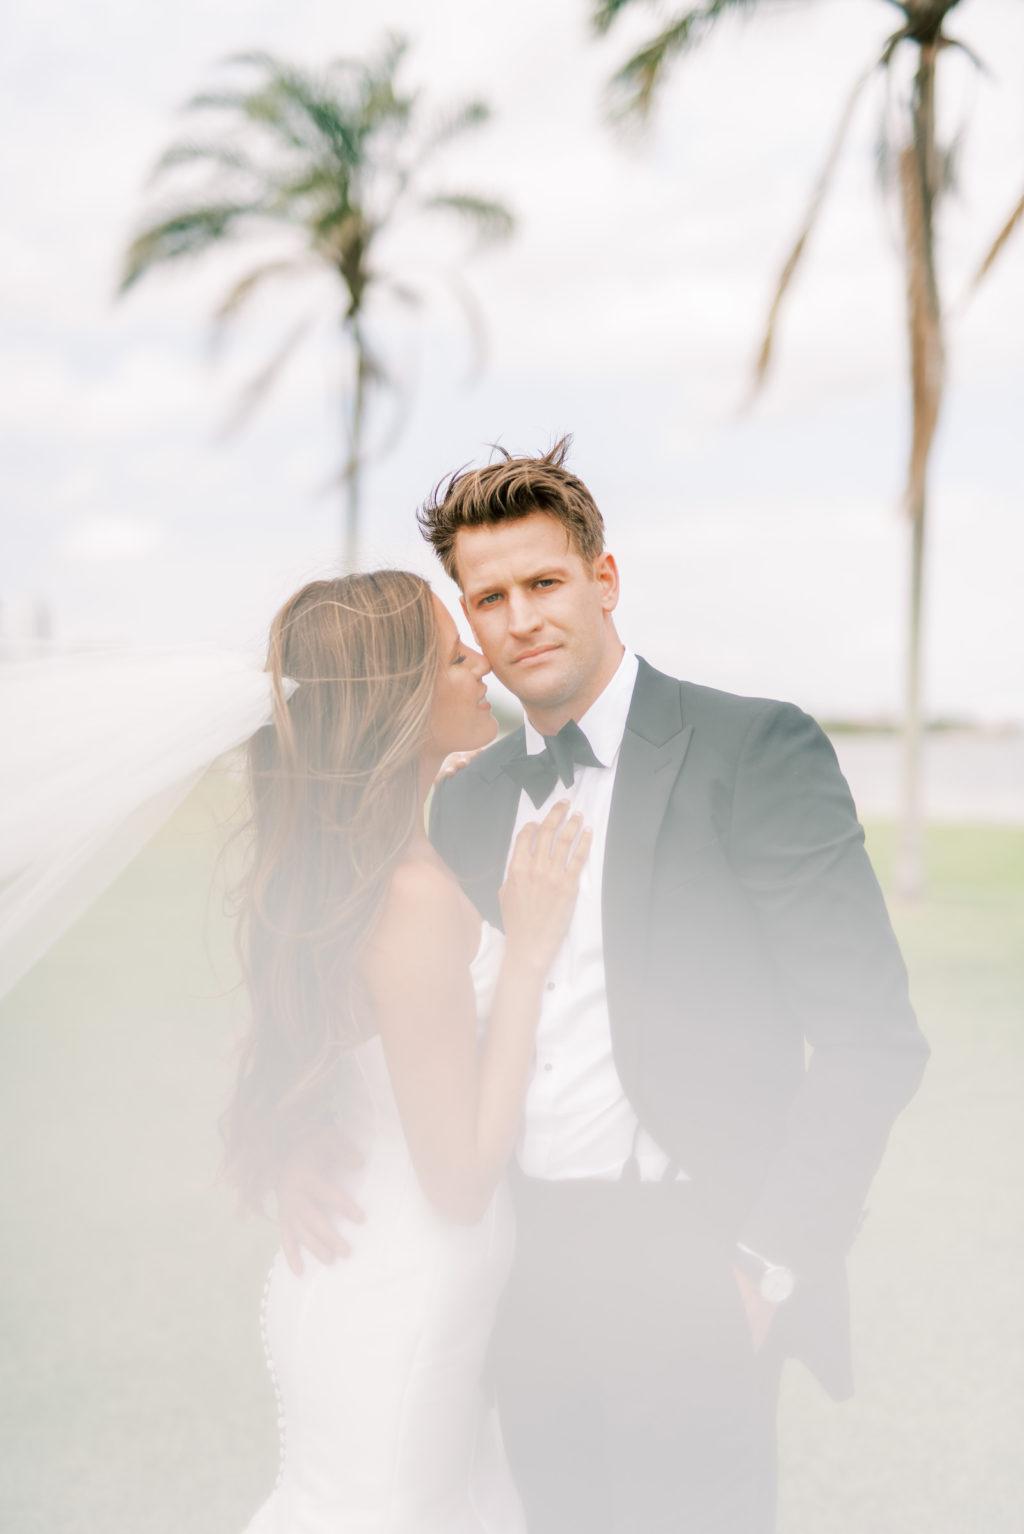 Creative Bride and Groom Veil Wedding Photo | Tampa Bay Wedding Photographer Kera Photography